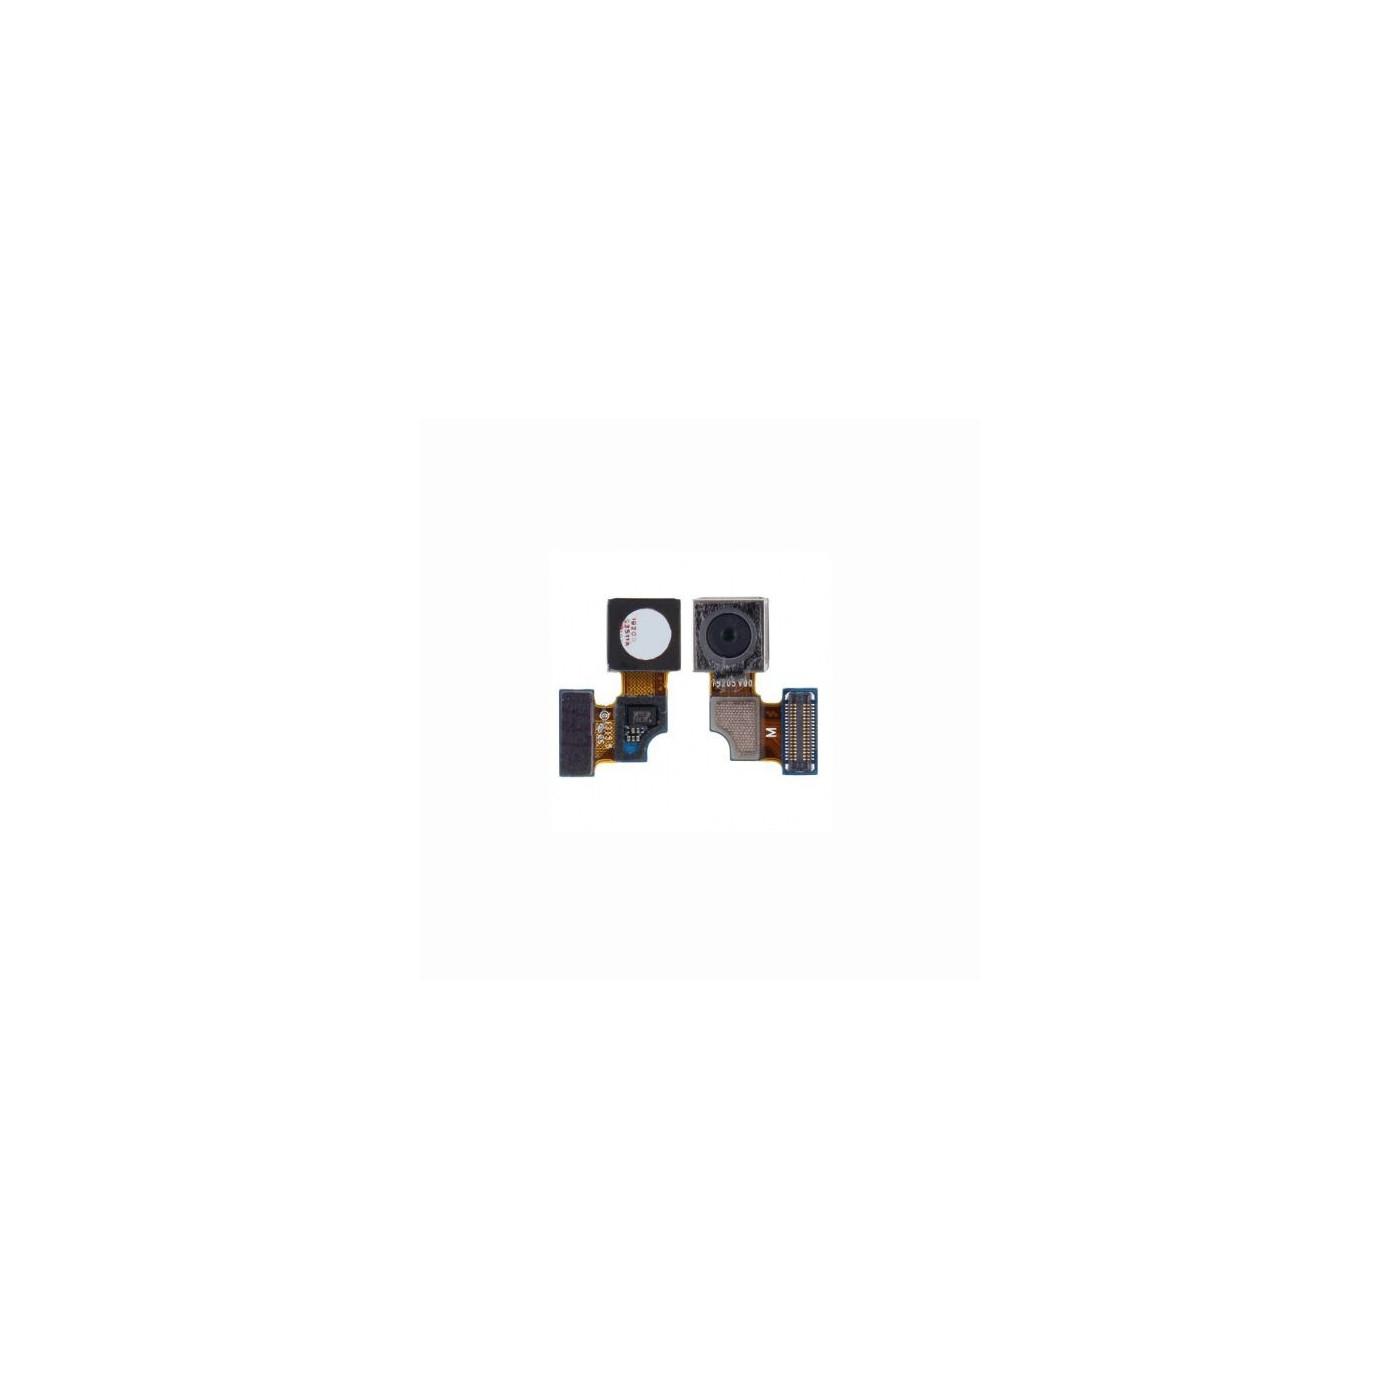 Caméra arrière pour caméra plate Samsung Galaxy Mega 6.3 GT-I9200